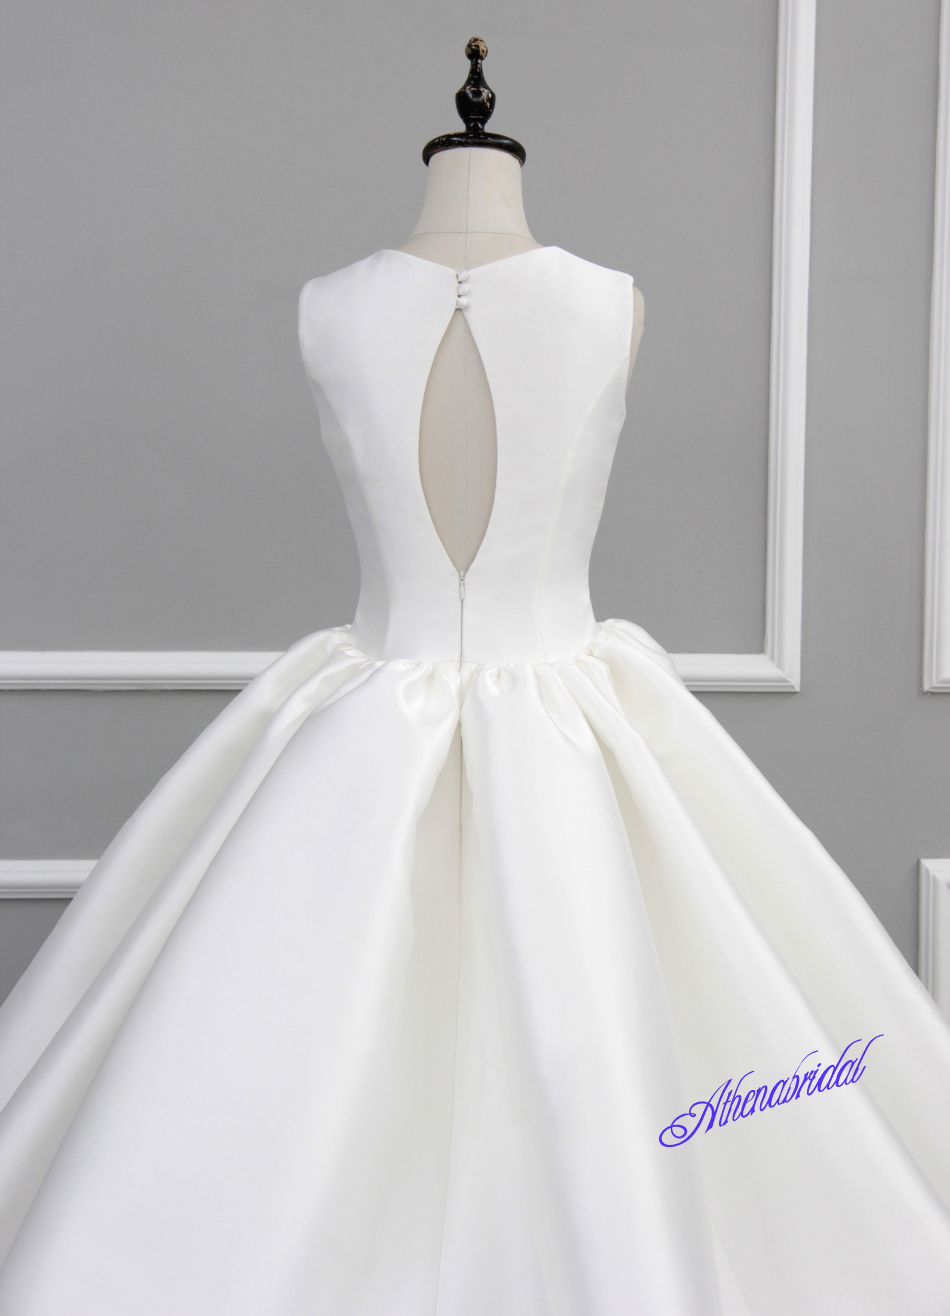 White wedding dress, strapless wedding dress, simple wedding dress ...